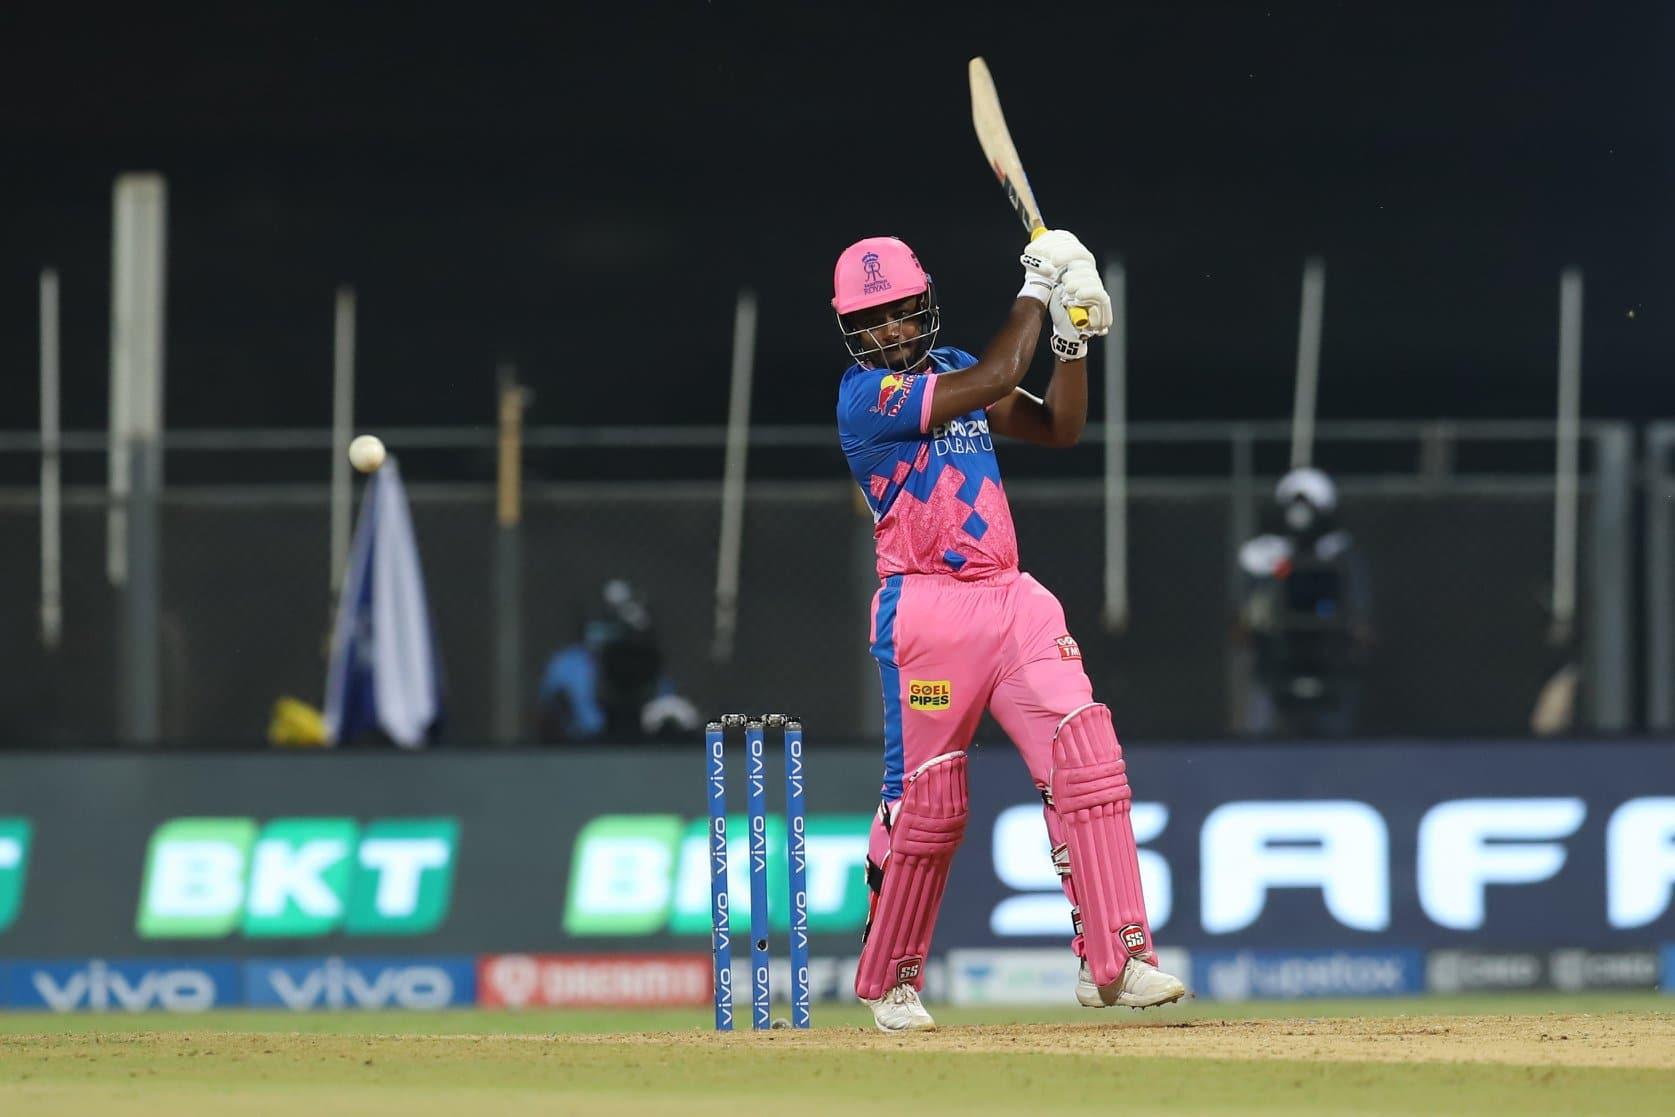 IPL 2021: RR captain Sanju Samson claims 'second half of knock was my best in IPL'